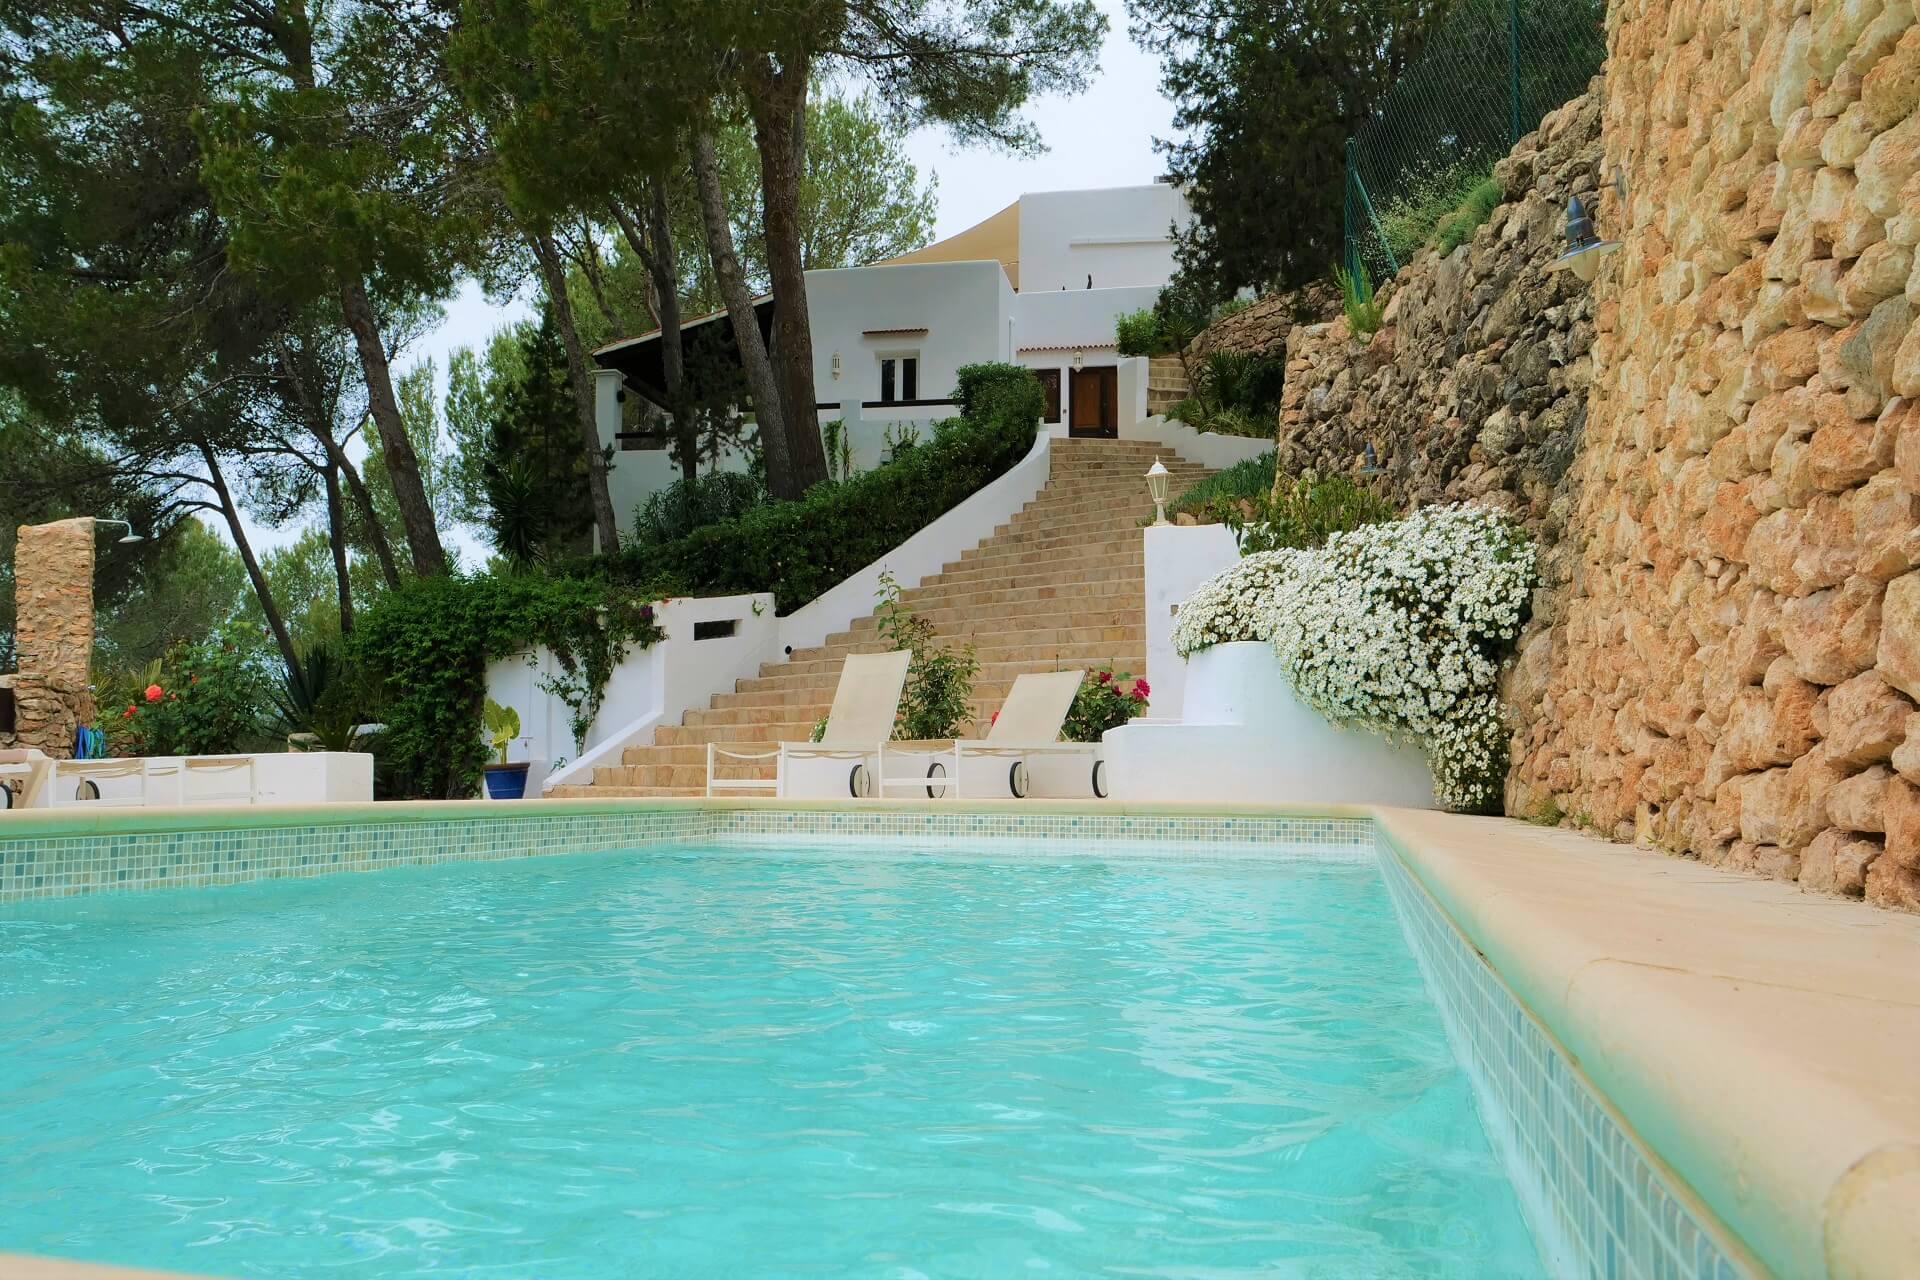 San Carlos - Pool